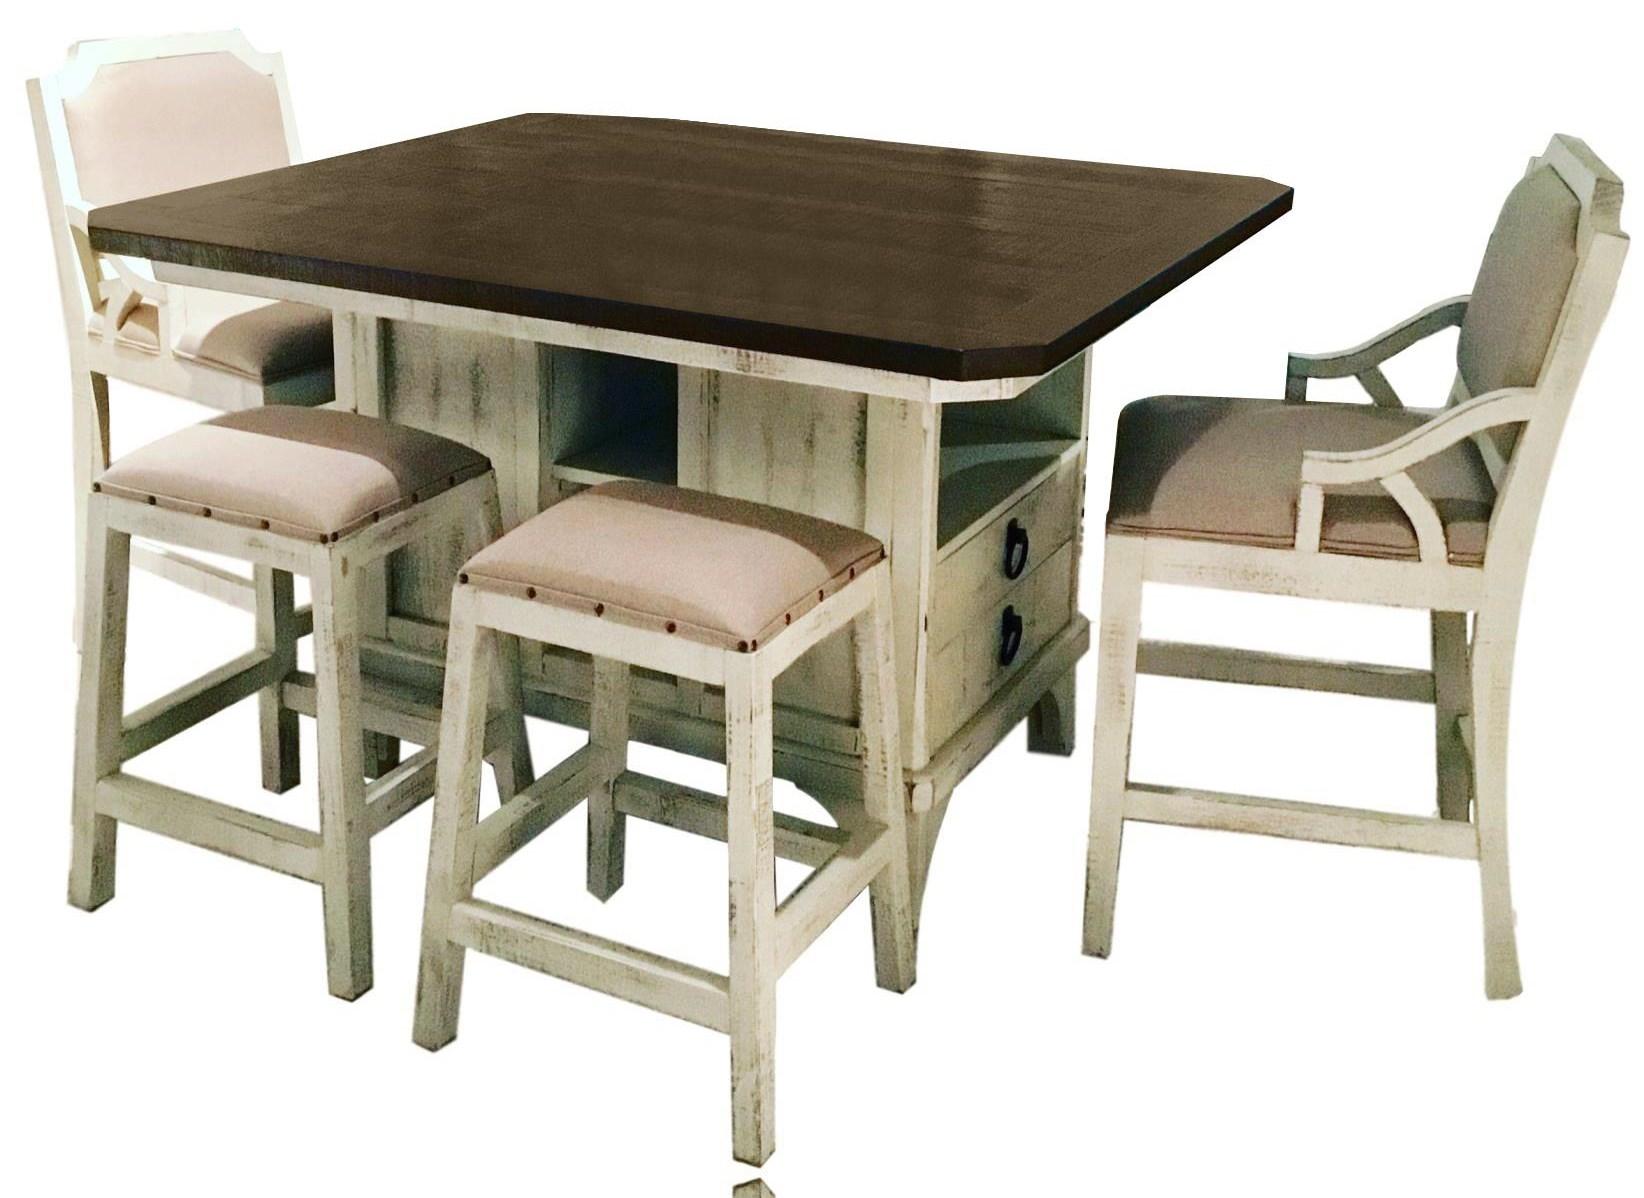 Island Table, 4 Backless Barstools, & 2 Bars